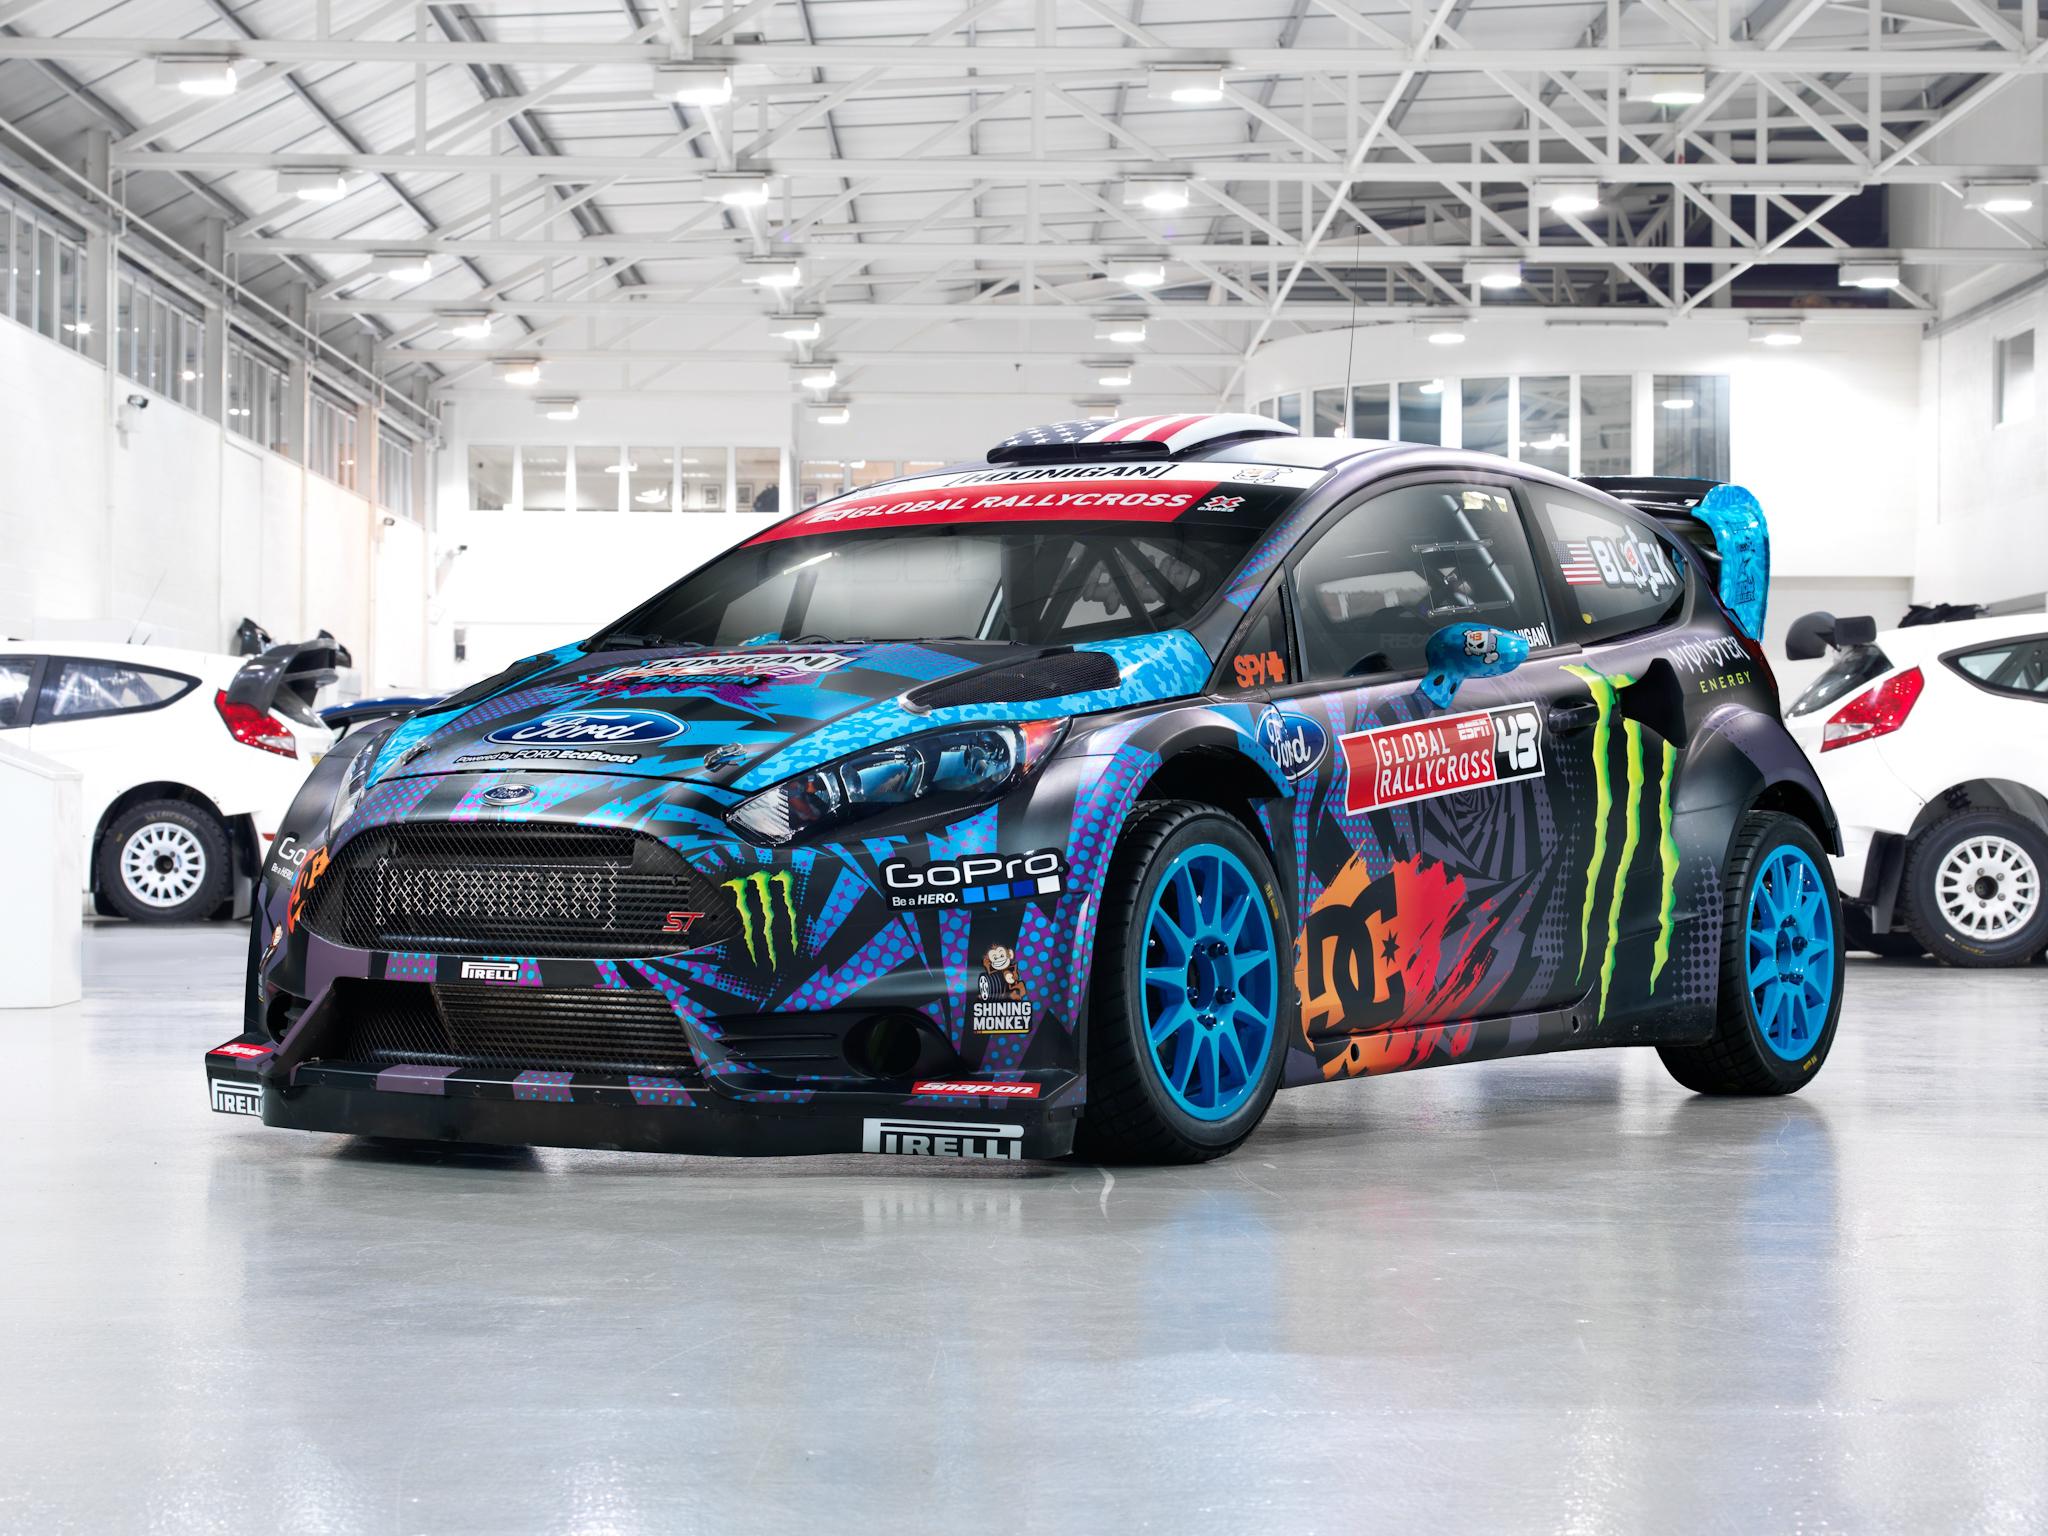 2013 Ford Fiesta S T Rx43 Rallycross Race Racing Tuning Wallpaper 2048x1536 86575 Wallpaperup